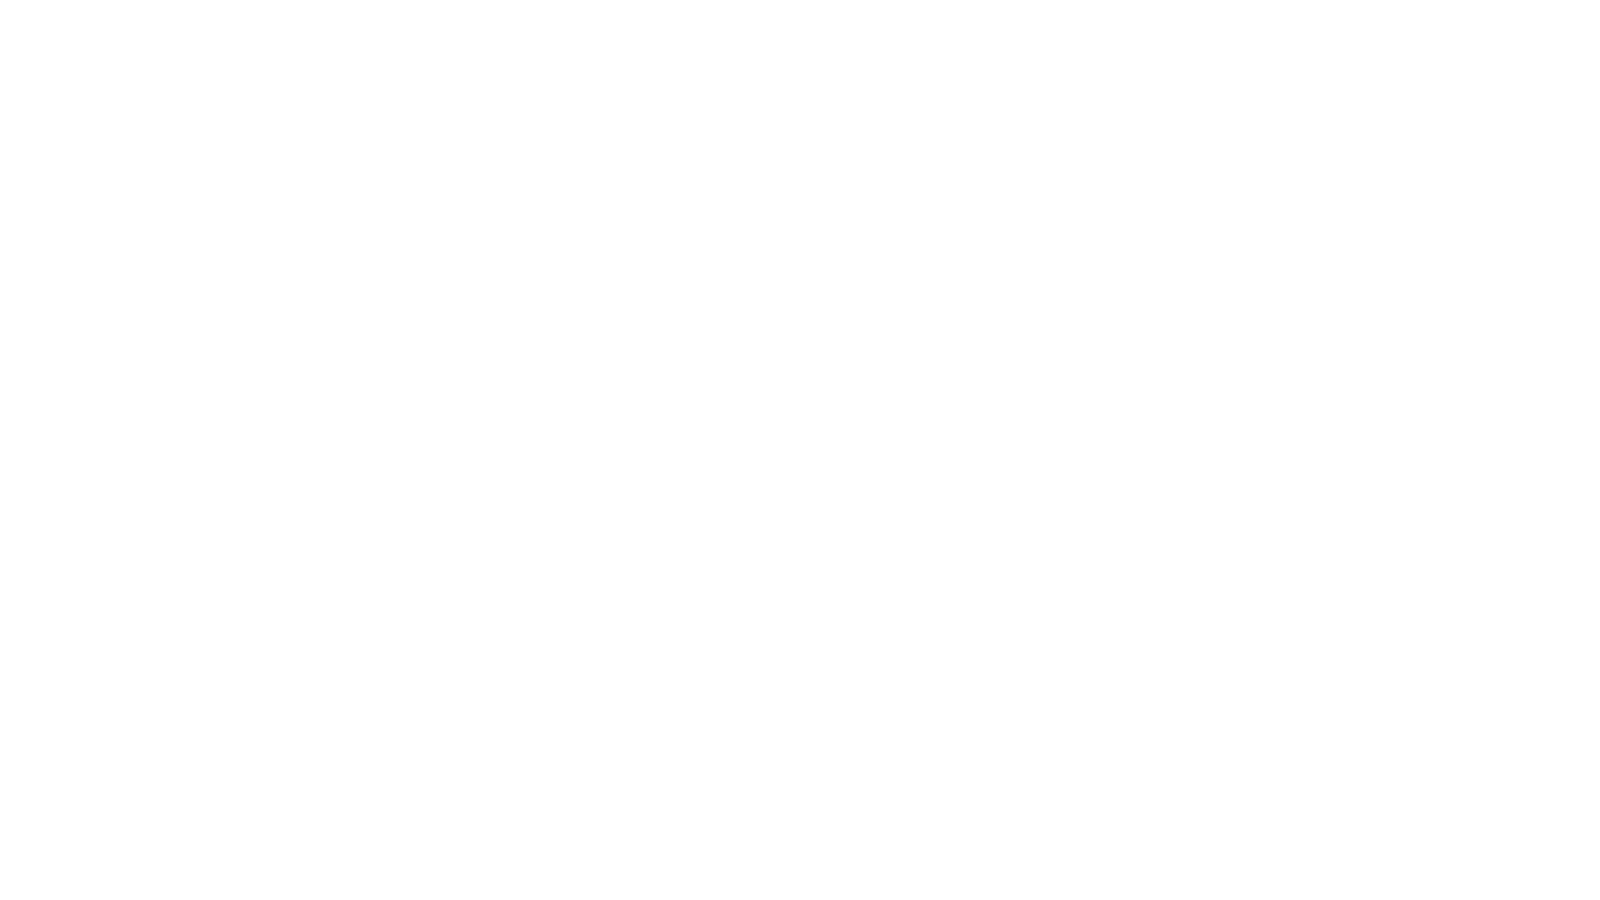 Infovideo für unseren Markteintritt in Brasilien für interessierte Arbeitgeber und interessierte Kandidaten  Vídeo informativo para nossa entrada no mercado no Brasil para empregadores e candidatos interessados  Info video for our market entry in Brazil for interested employers and interested candidates  Links: http://www.jobsandspirit.com/  https://www.facebook.com/groups/1105445426566720/  https://www.facebook.com/JobsAndSpirit/  https://www.instagram.com/jobs_and_spirit/  https://www.linkedin.com/company/jobs-spirit  ---  Music/Musik/Muzika/Música: Shadows On The Wall by Jonny Easton Link: https://youtu.be/8nUf1h0rT28  Check out his channel Link: https://www.youtube.com/jonnyeaston